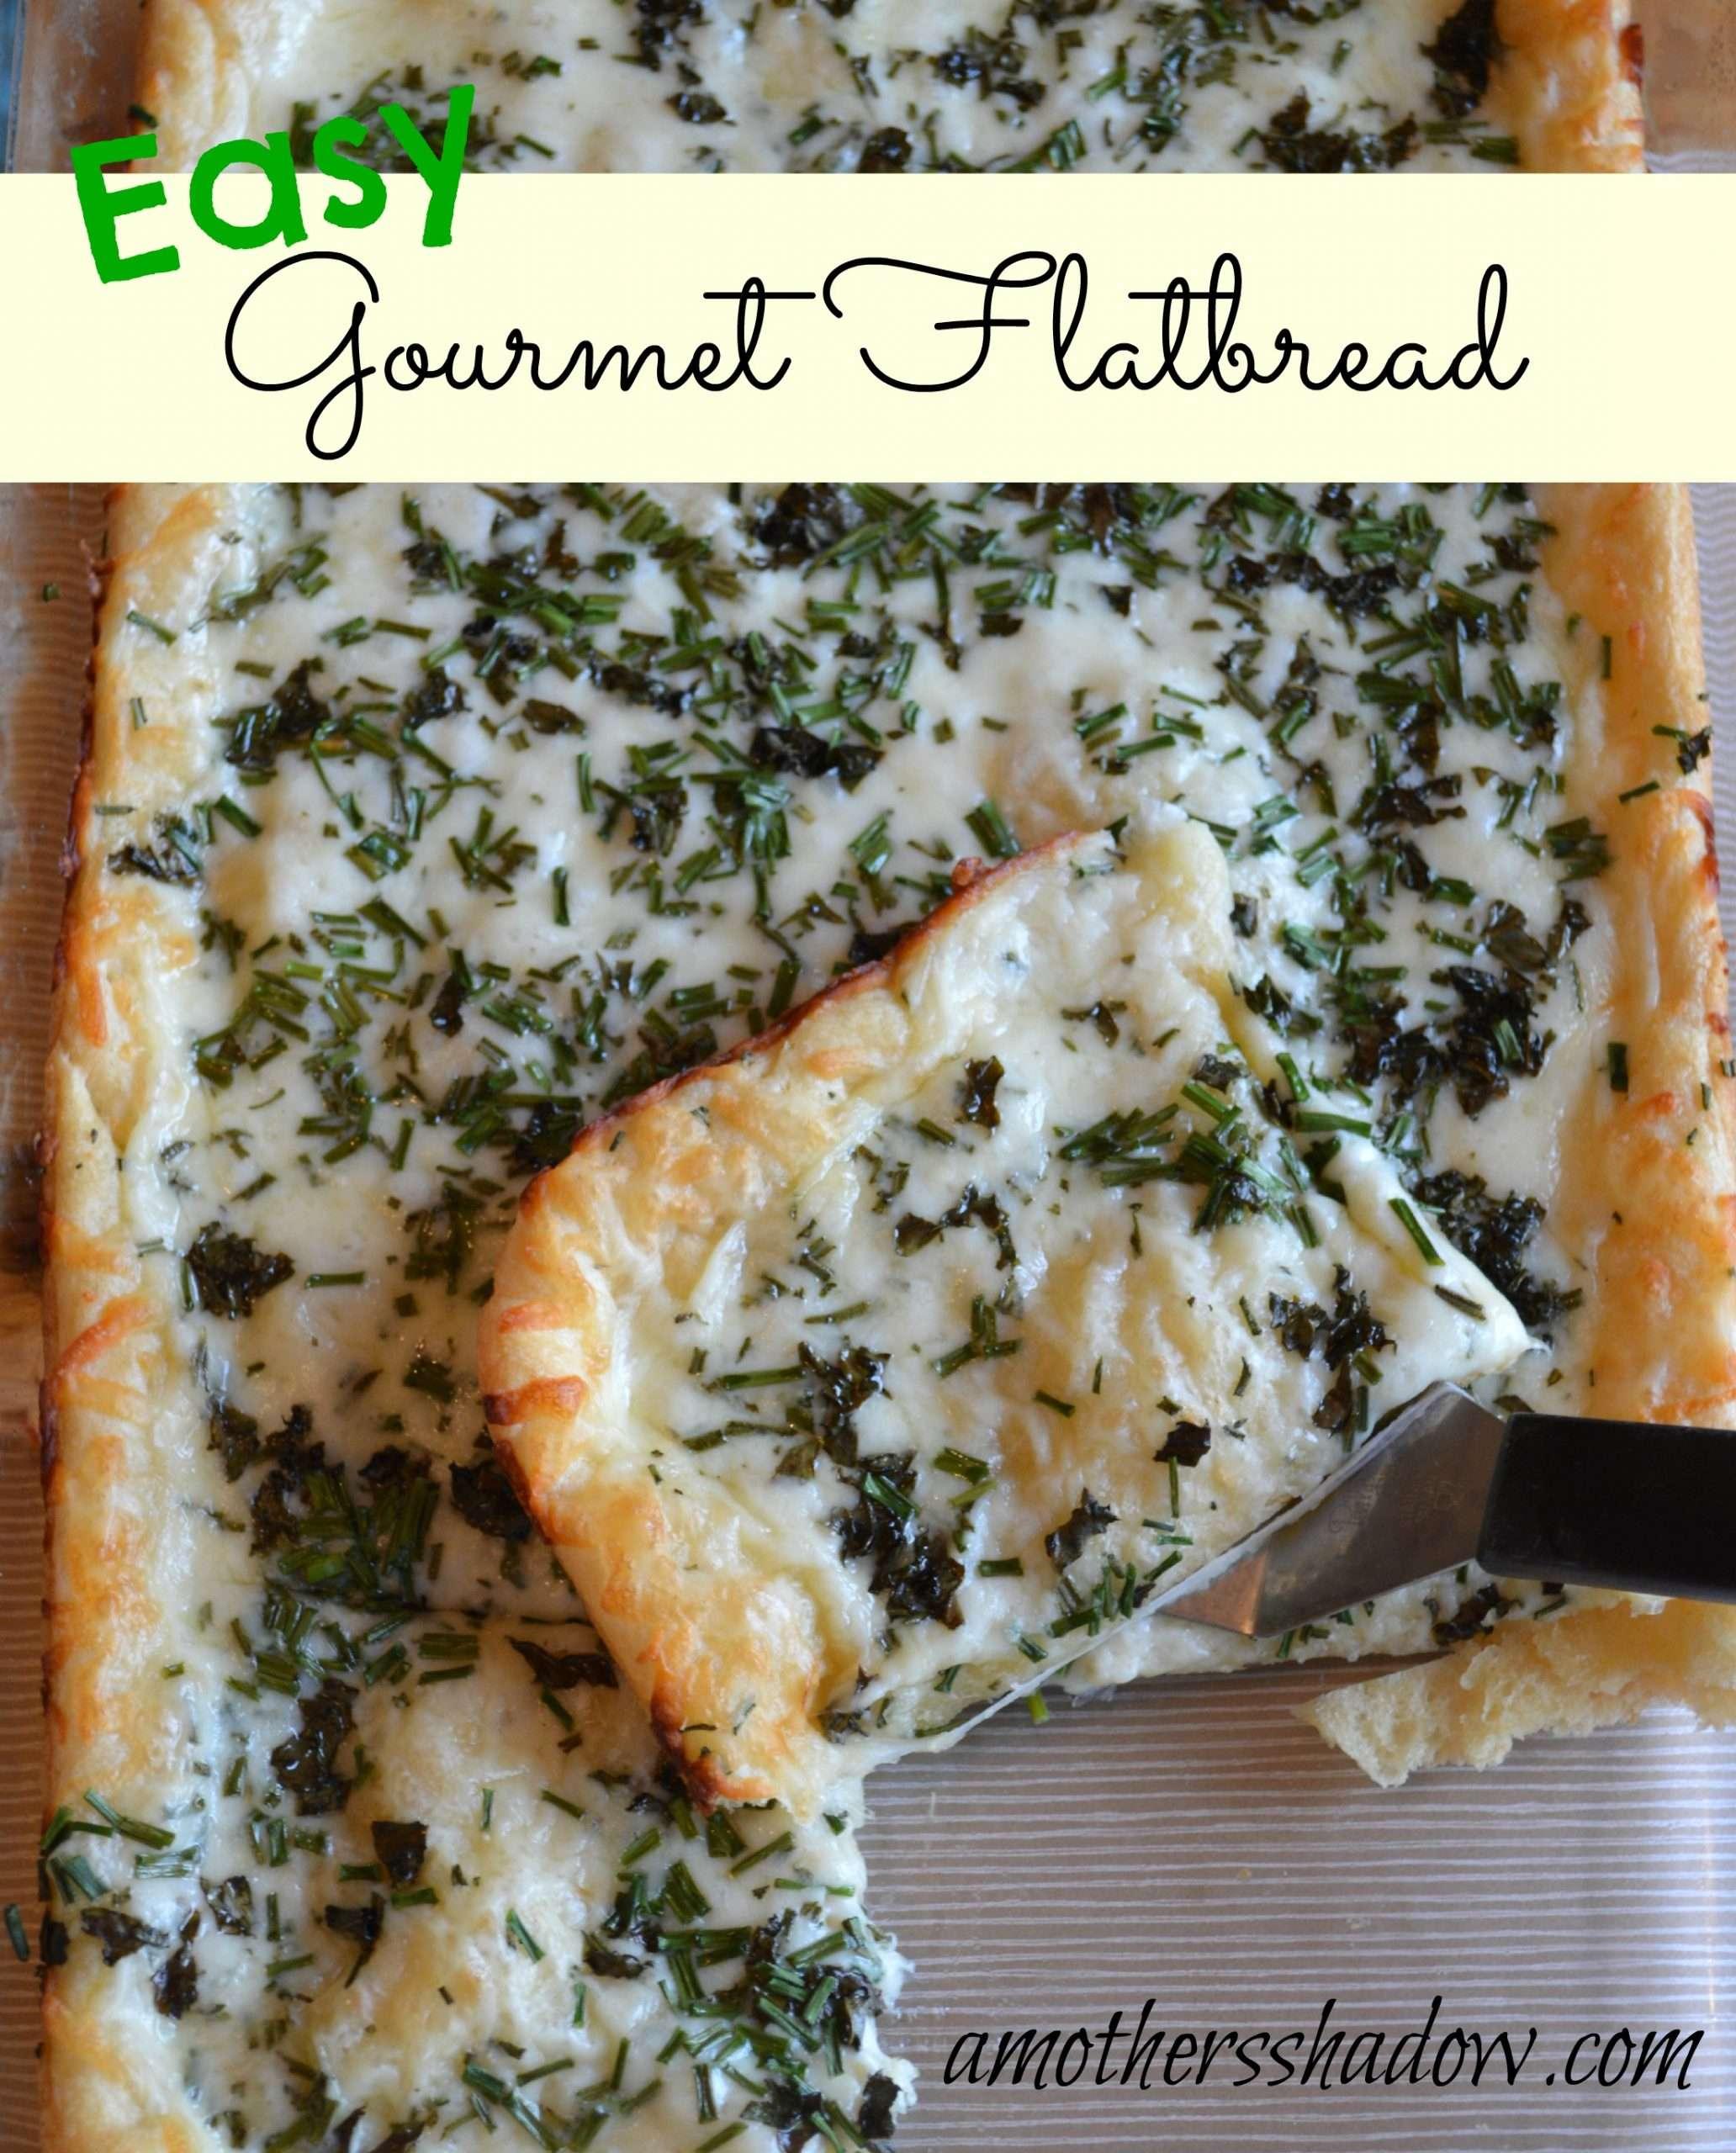 Easy Gourmet Flat Bread